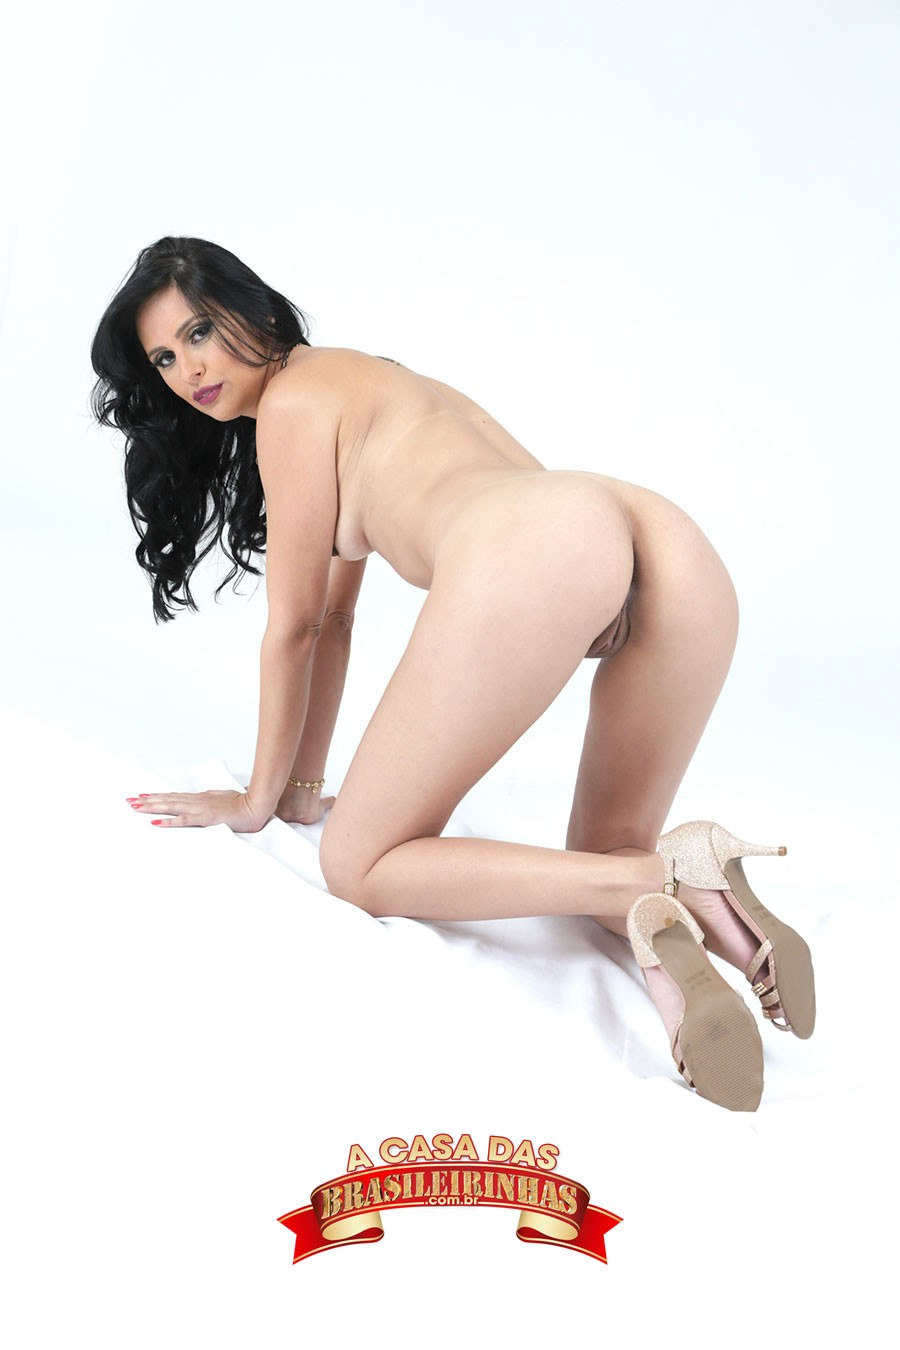 Novata-Anny-Fernandez.jpg